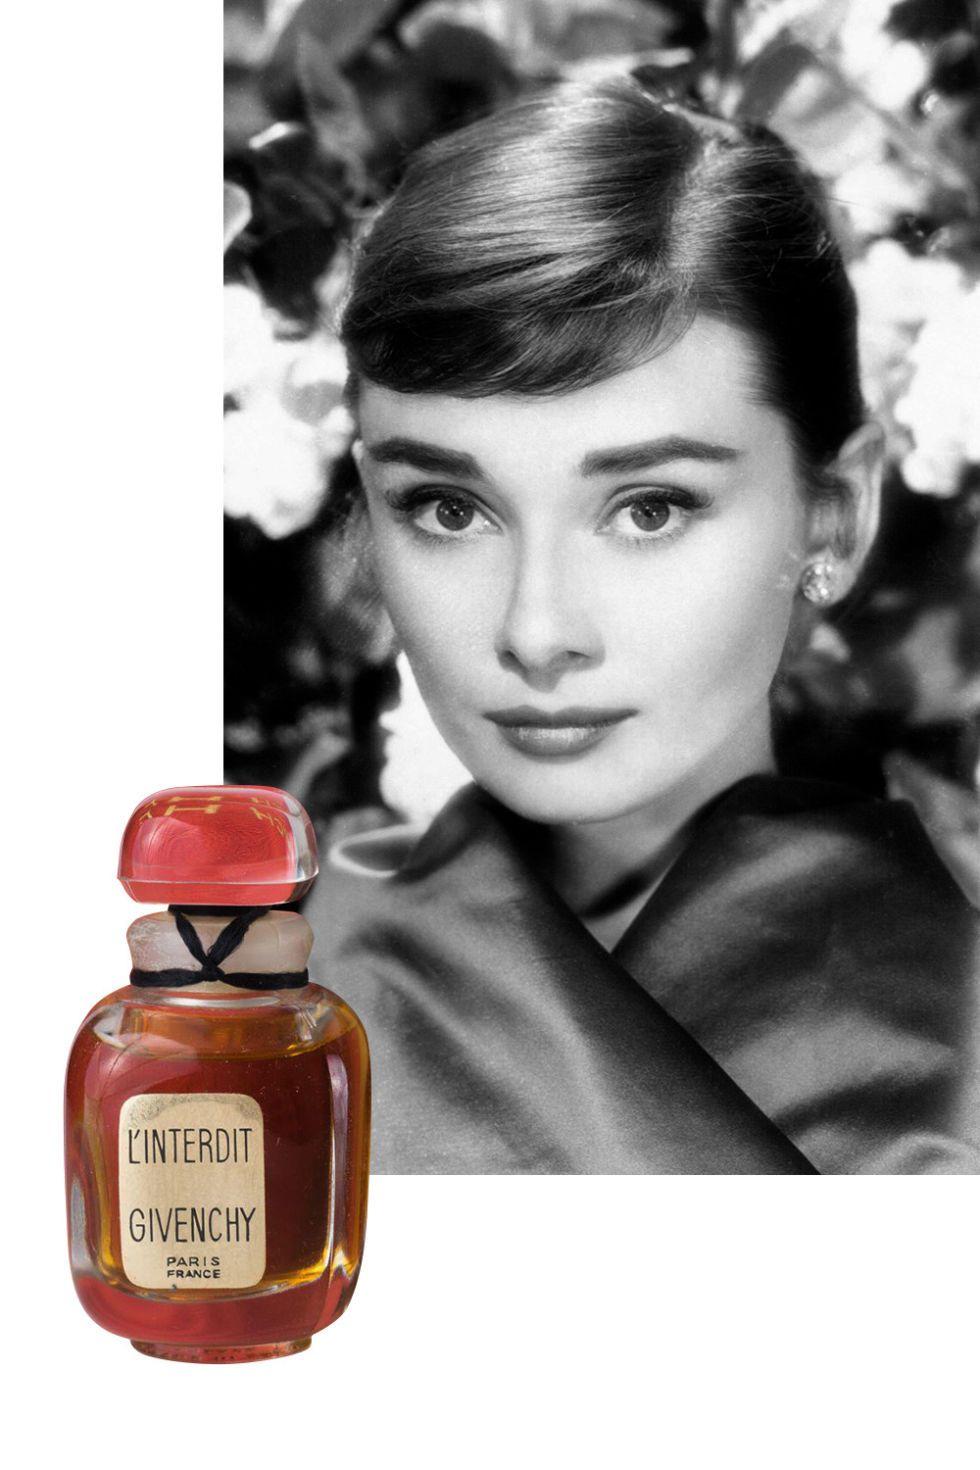 Their 14 Famous PerfumesI Random Wantso Women And Favorite fYgb76y